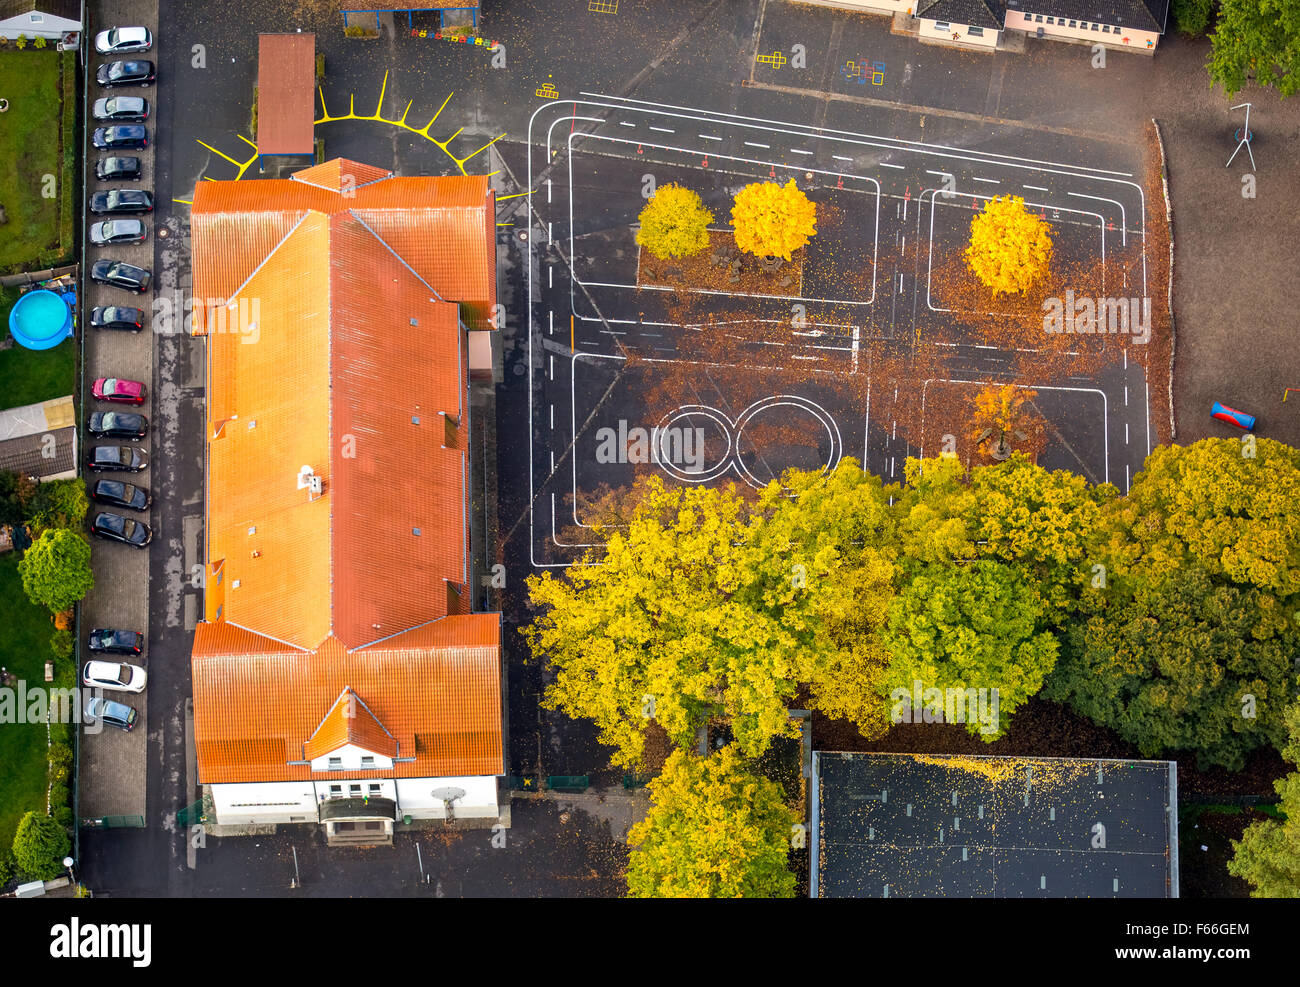 Lessingschule, Lessing School, Schoolyard, School, luminous trees, autumn leaves, Herringen - Stock Image